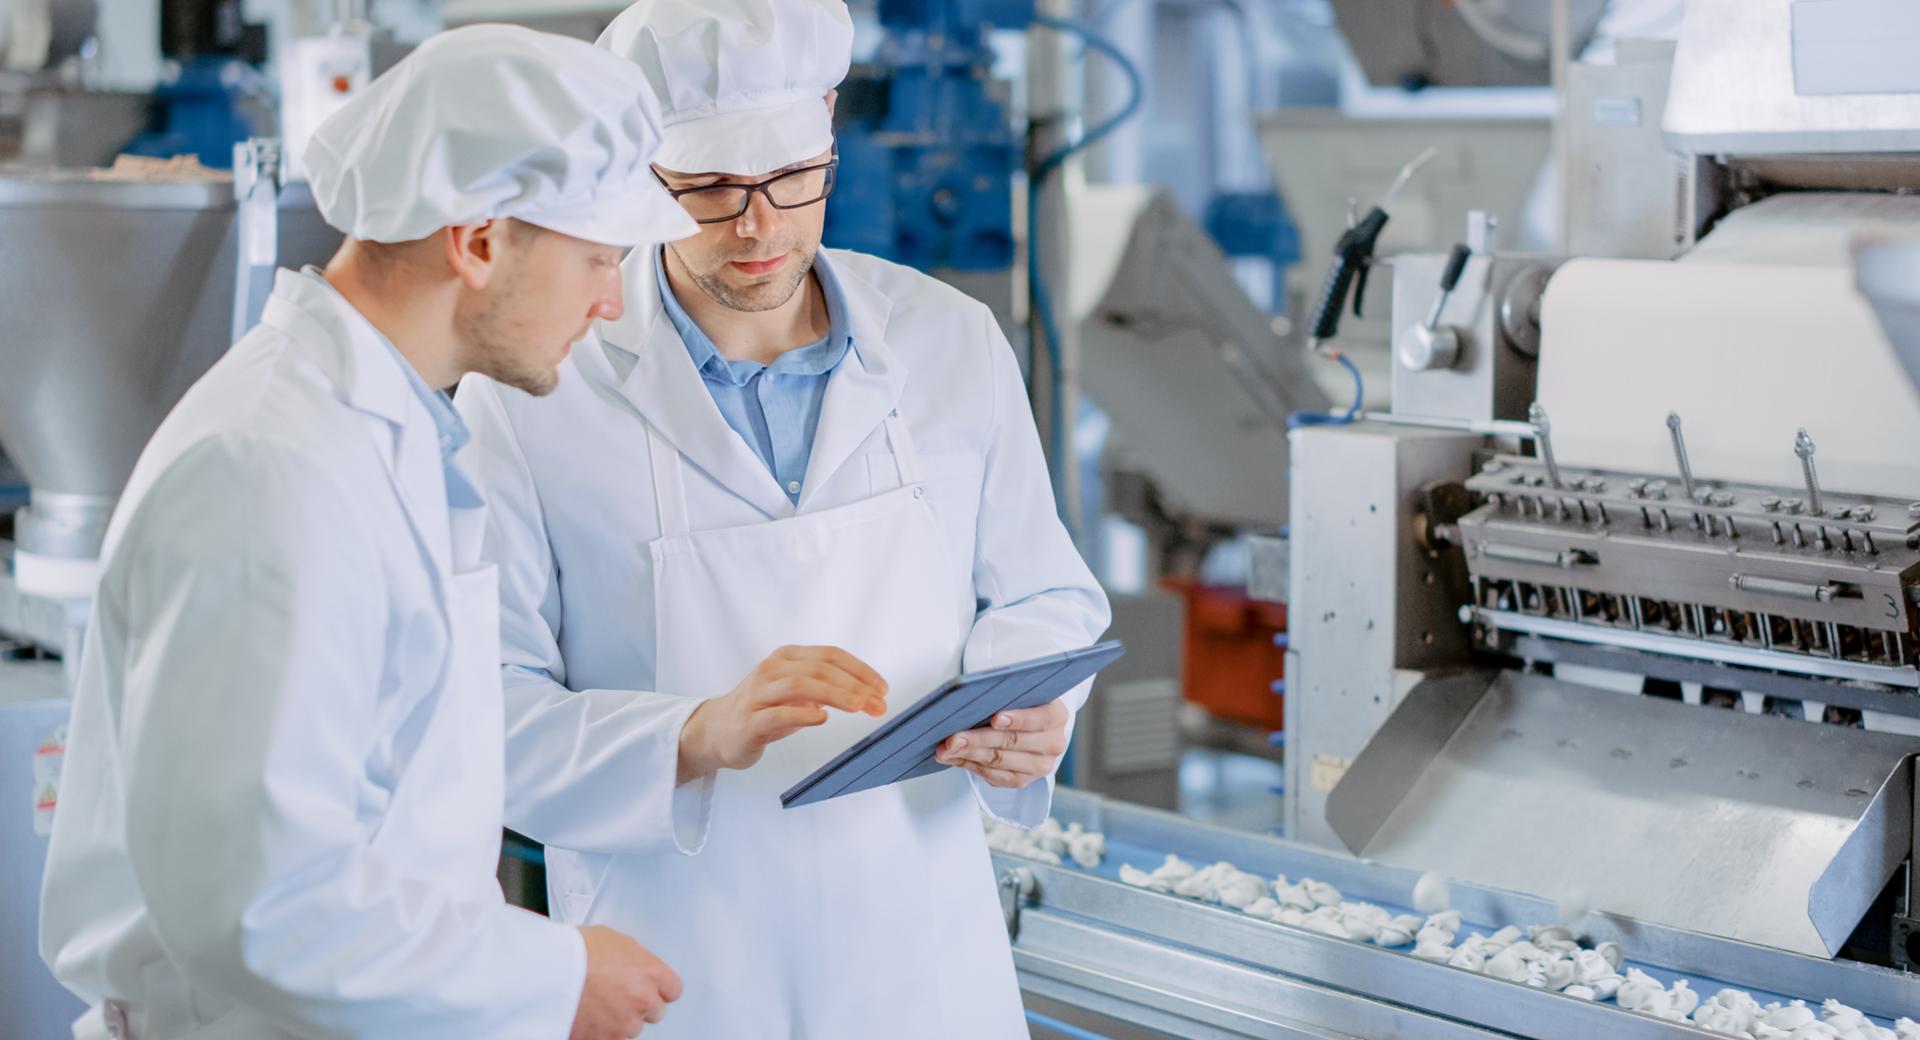 Webinar Arbeitsschutz in der Lebensmittelbranche